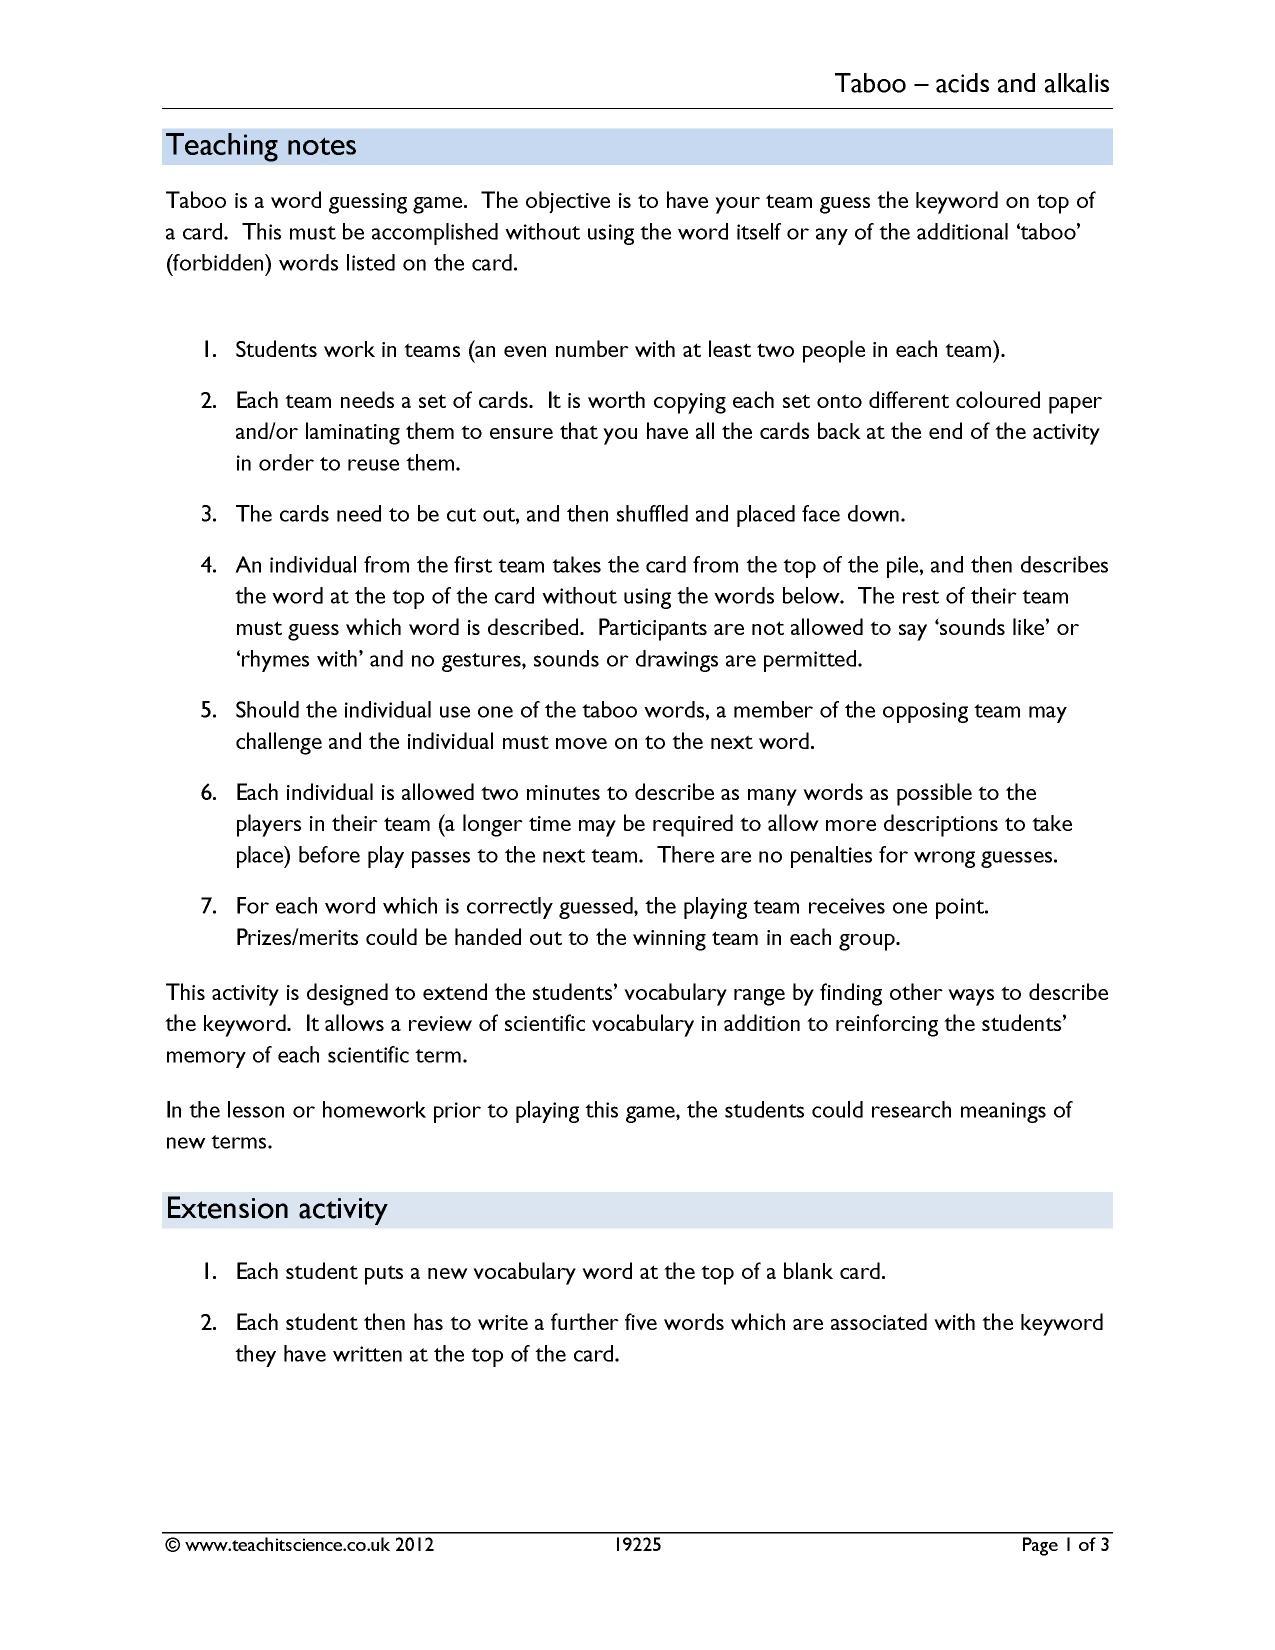 Worksheets Ecology Vocabulary Worksheet Waytoohuman Free Worksheets For Kids Amp Printables